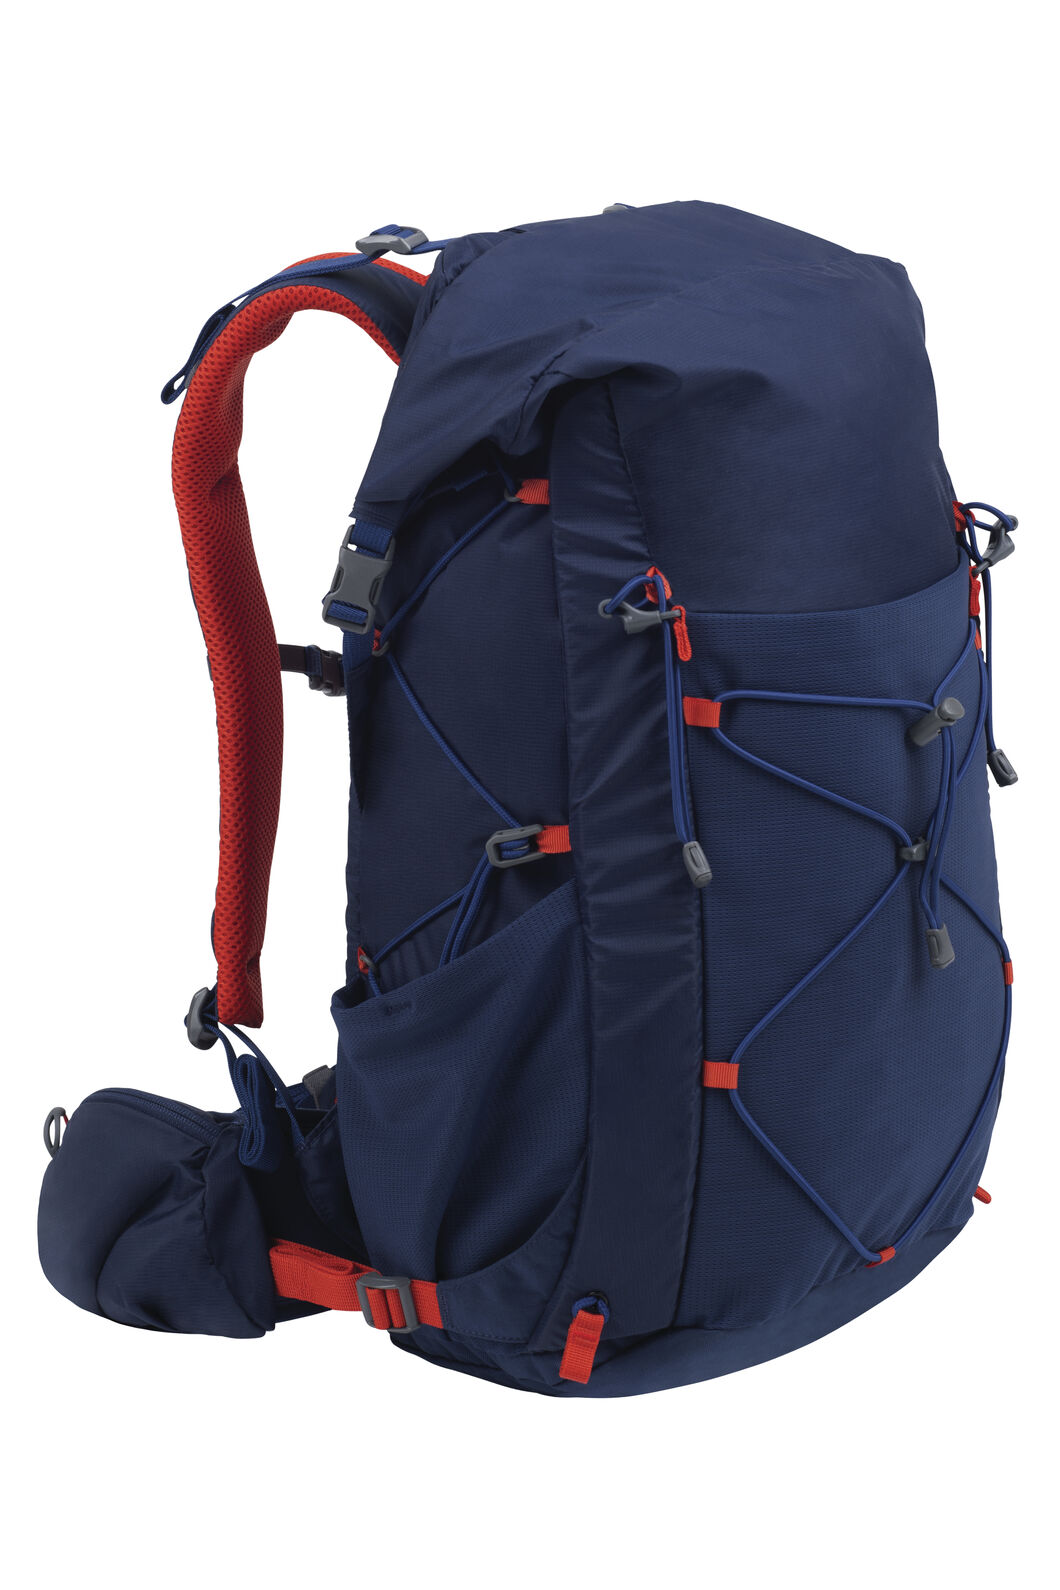 Macpac Fiord 28L Pack, Medieval Blue, hi-res